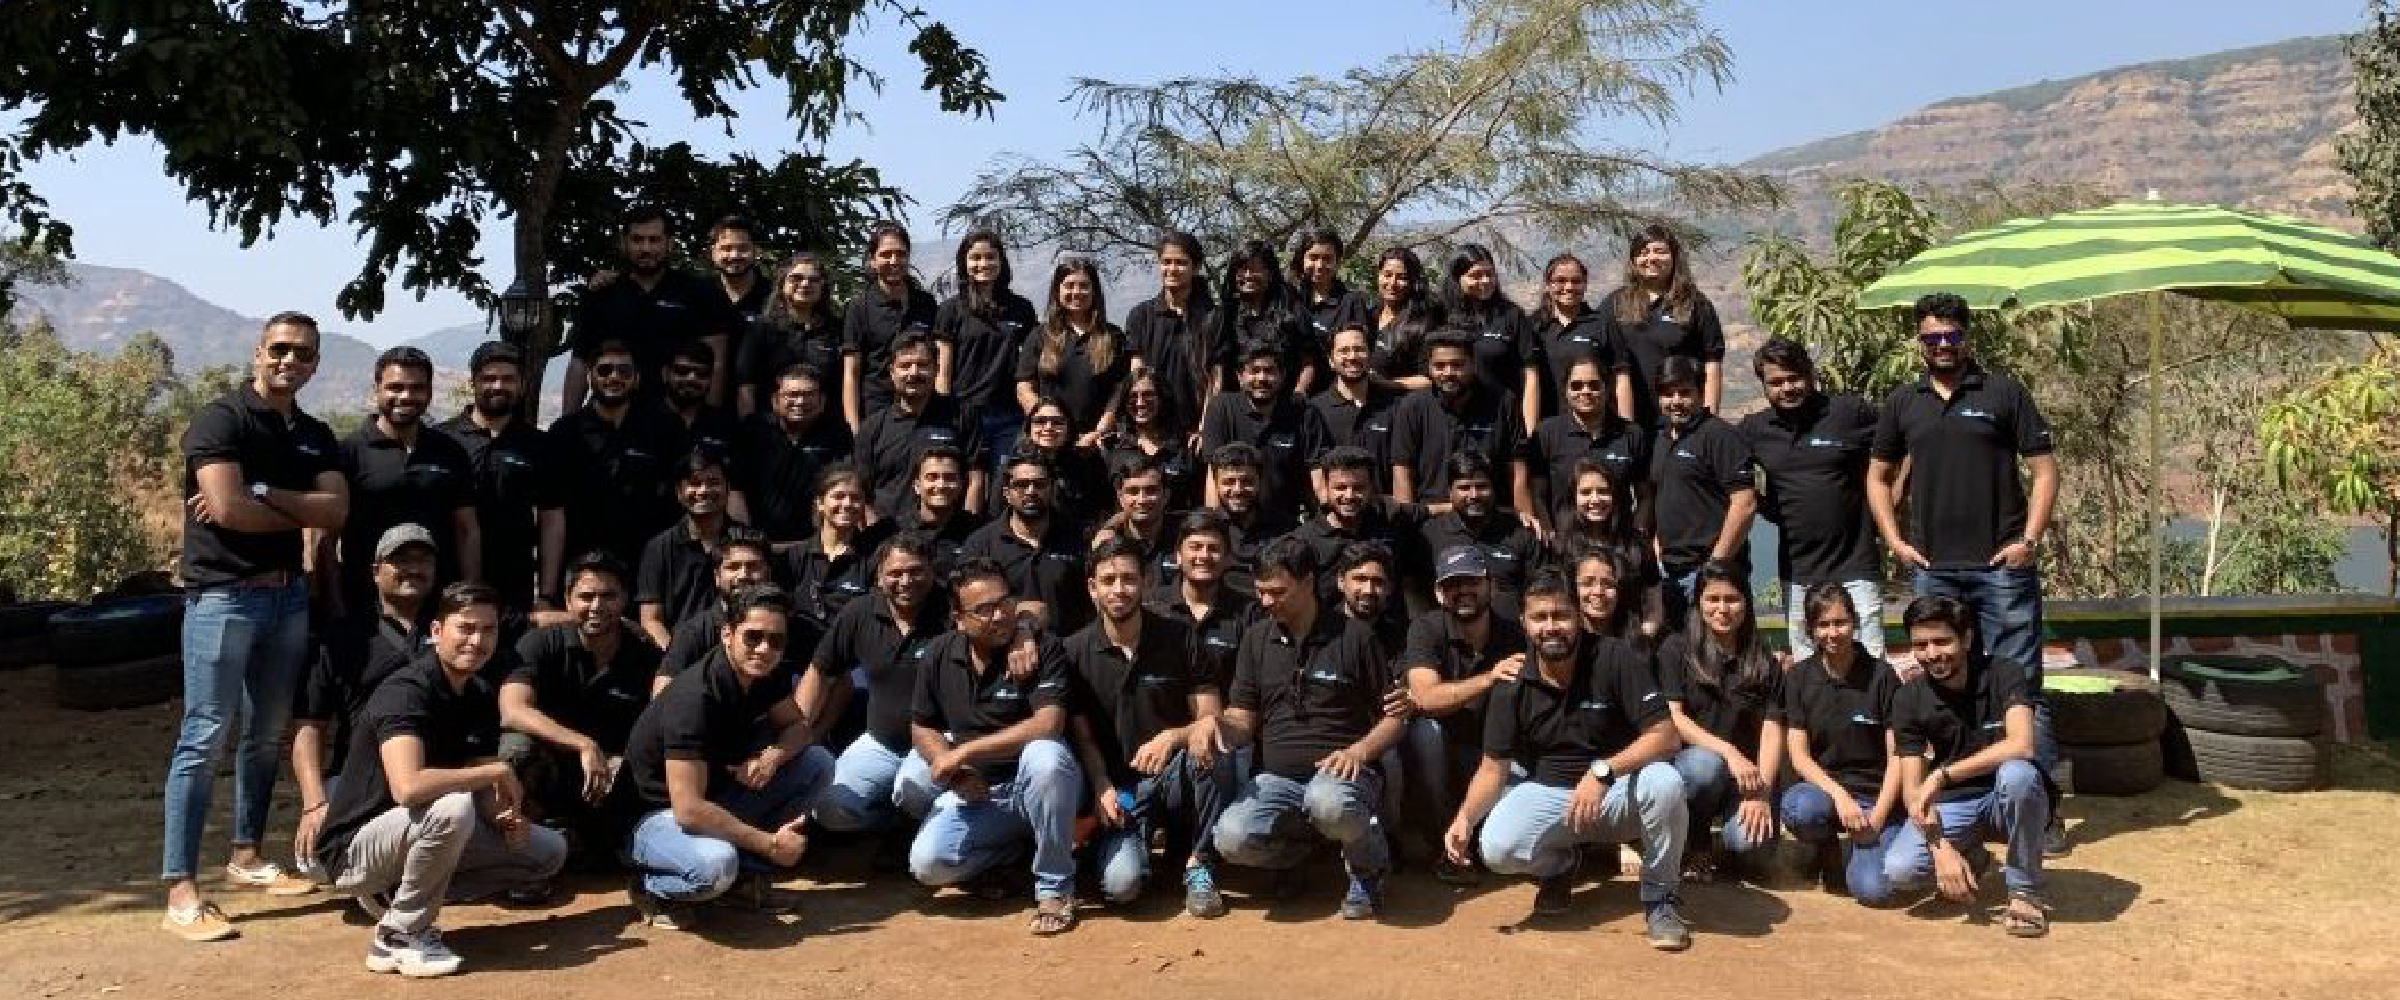 Team India-Motifworks